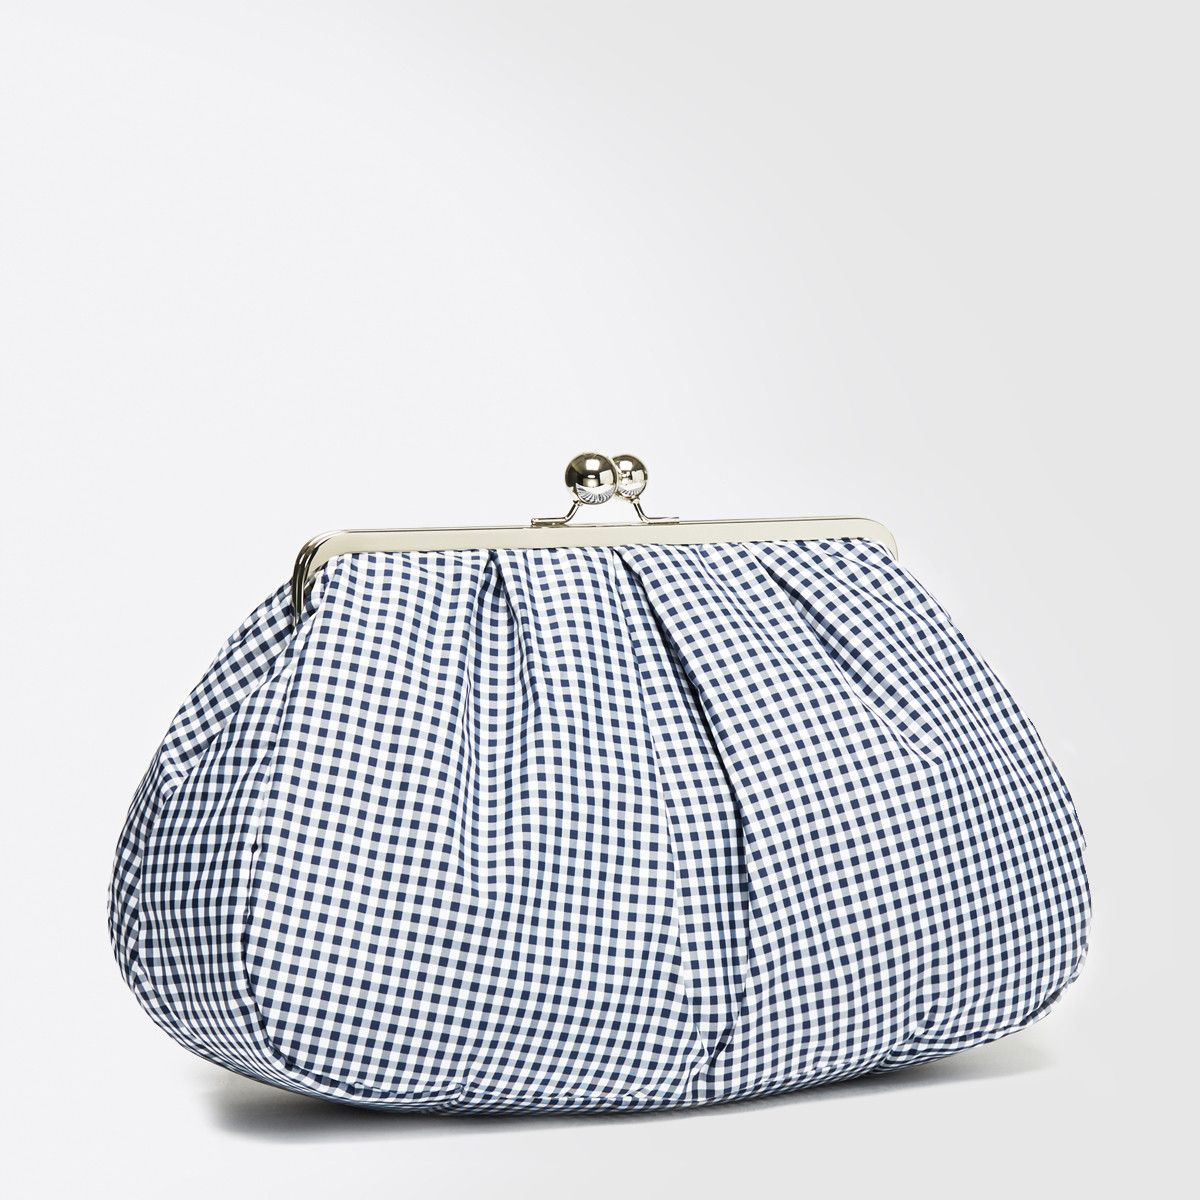 dce2749951 Pasticcino bag, blu-marino -